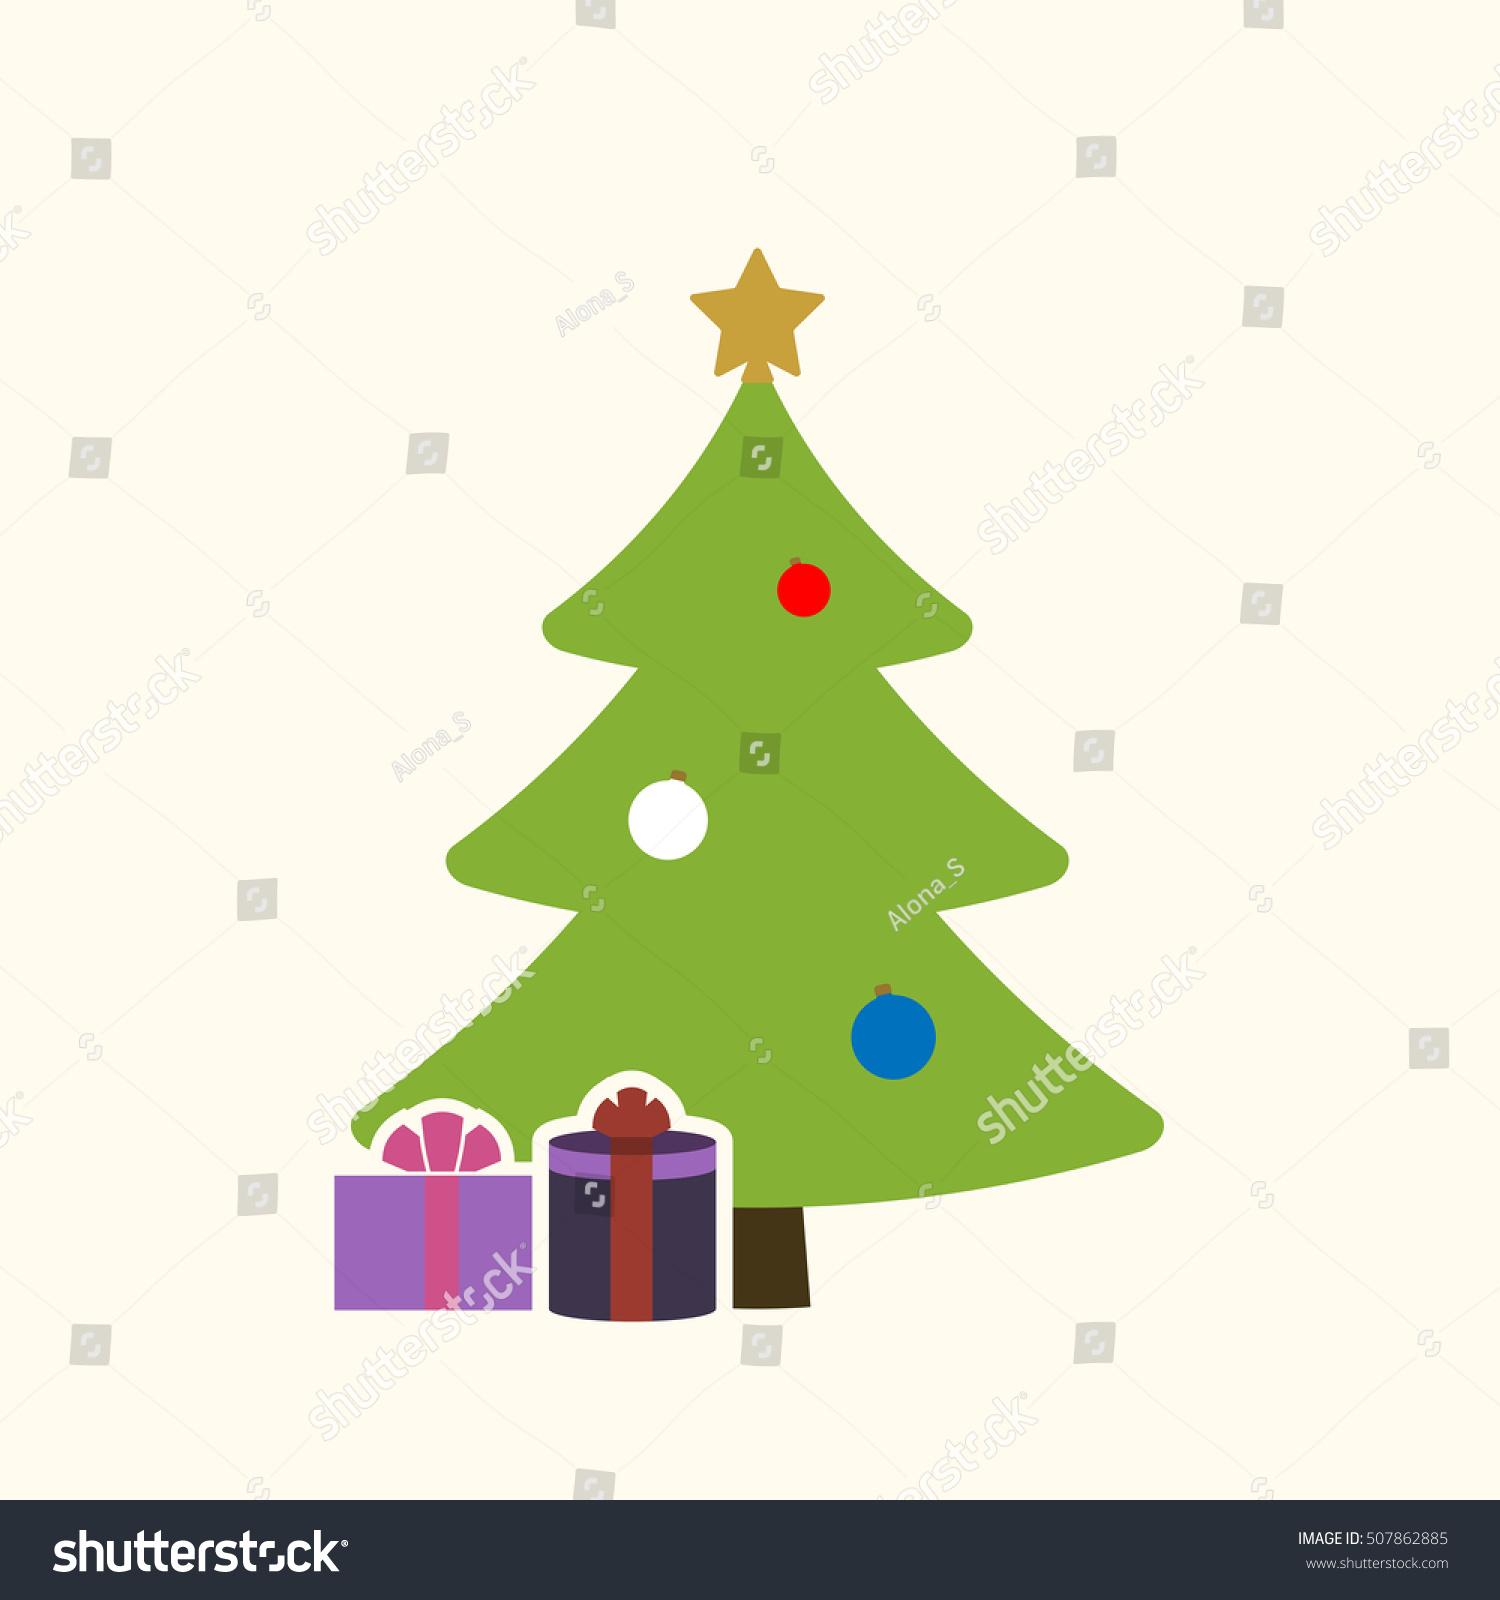 Christmas tree balls star gift cartoon stock vector